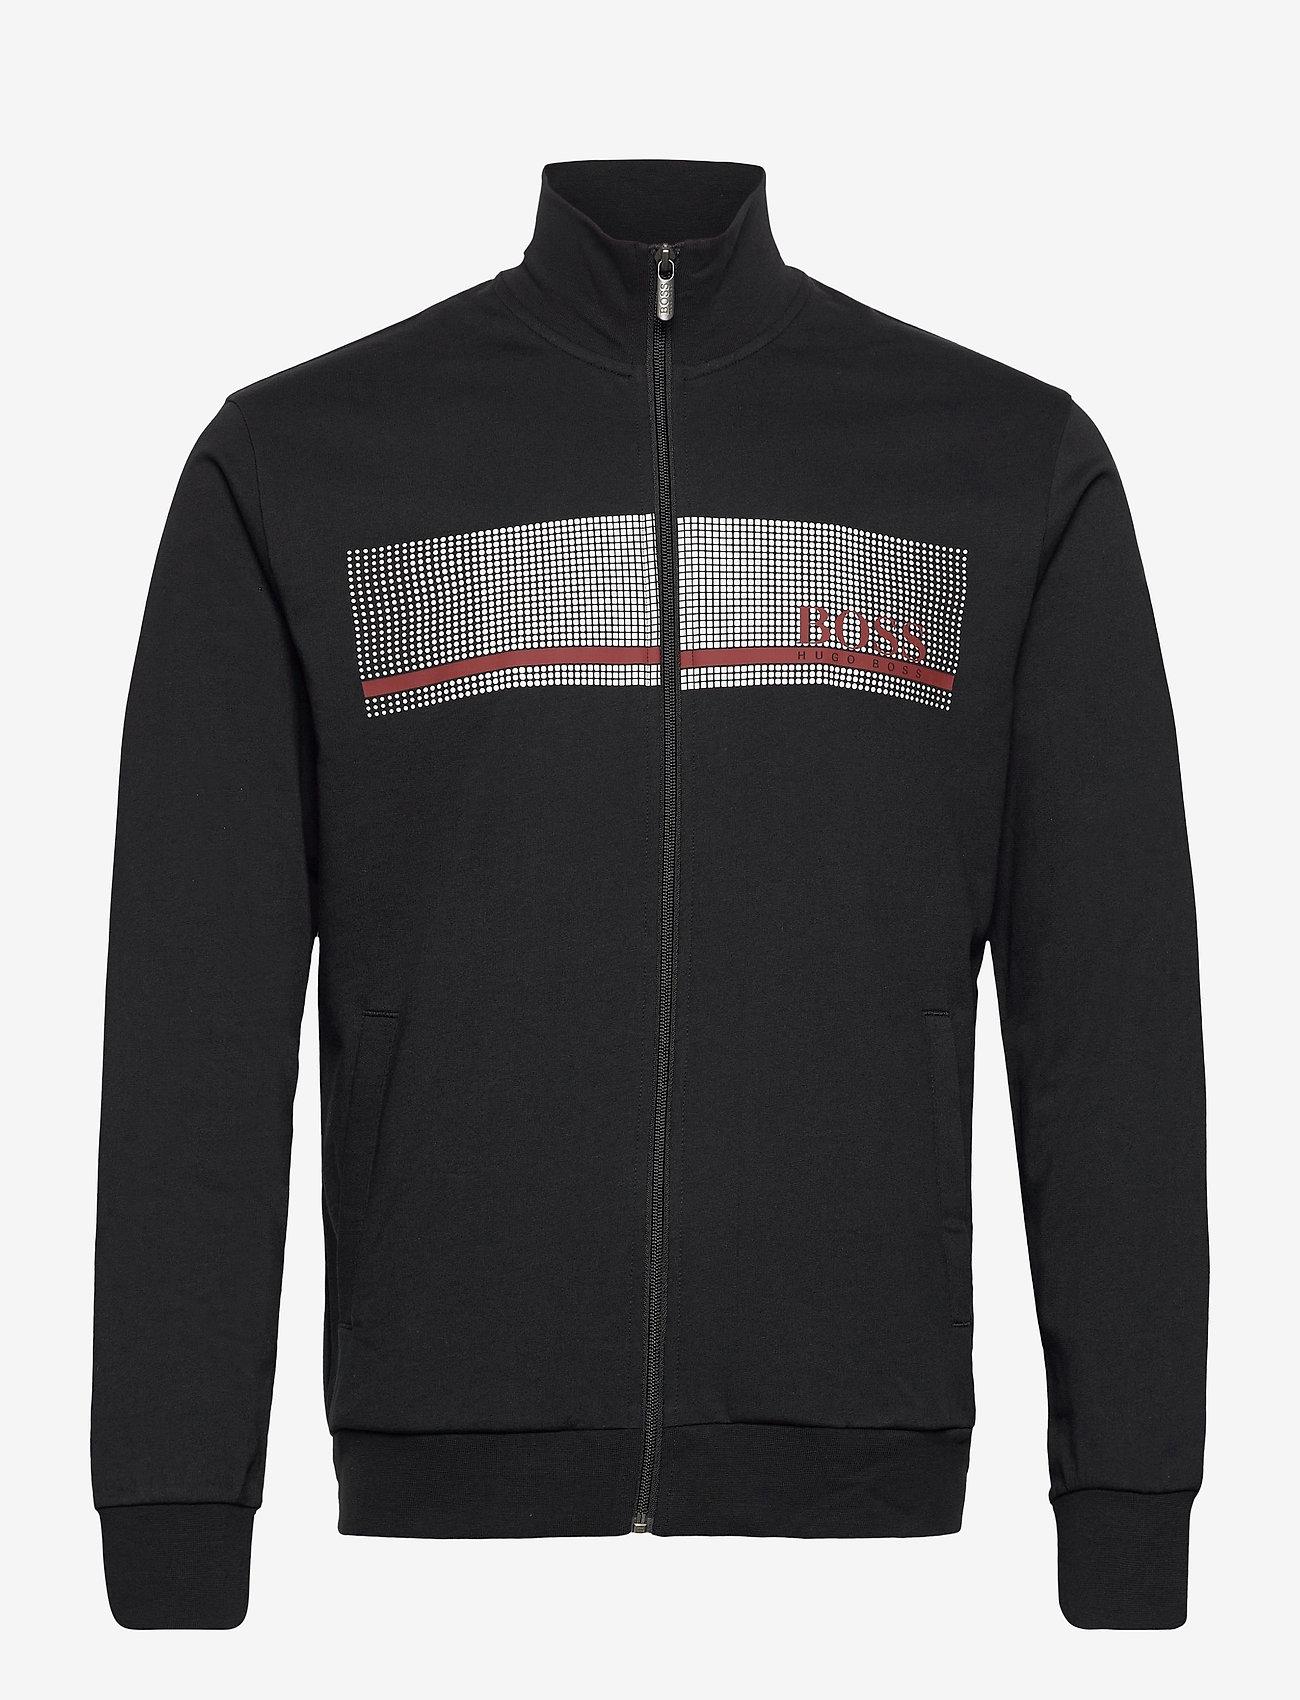 BOSS - Authentic Jacket Z - sweats - black - 0